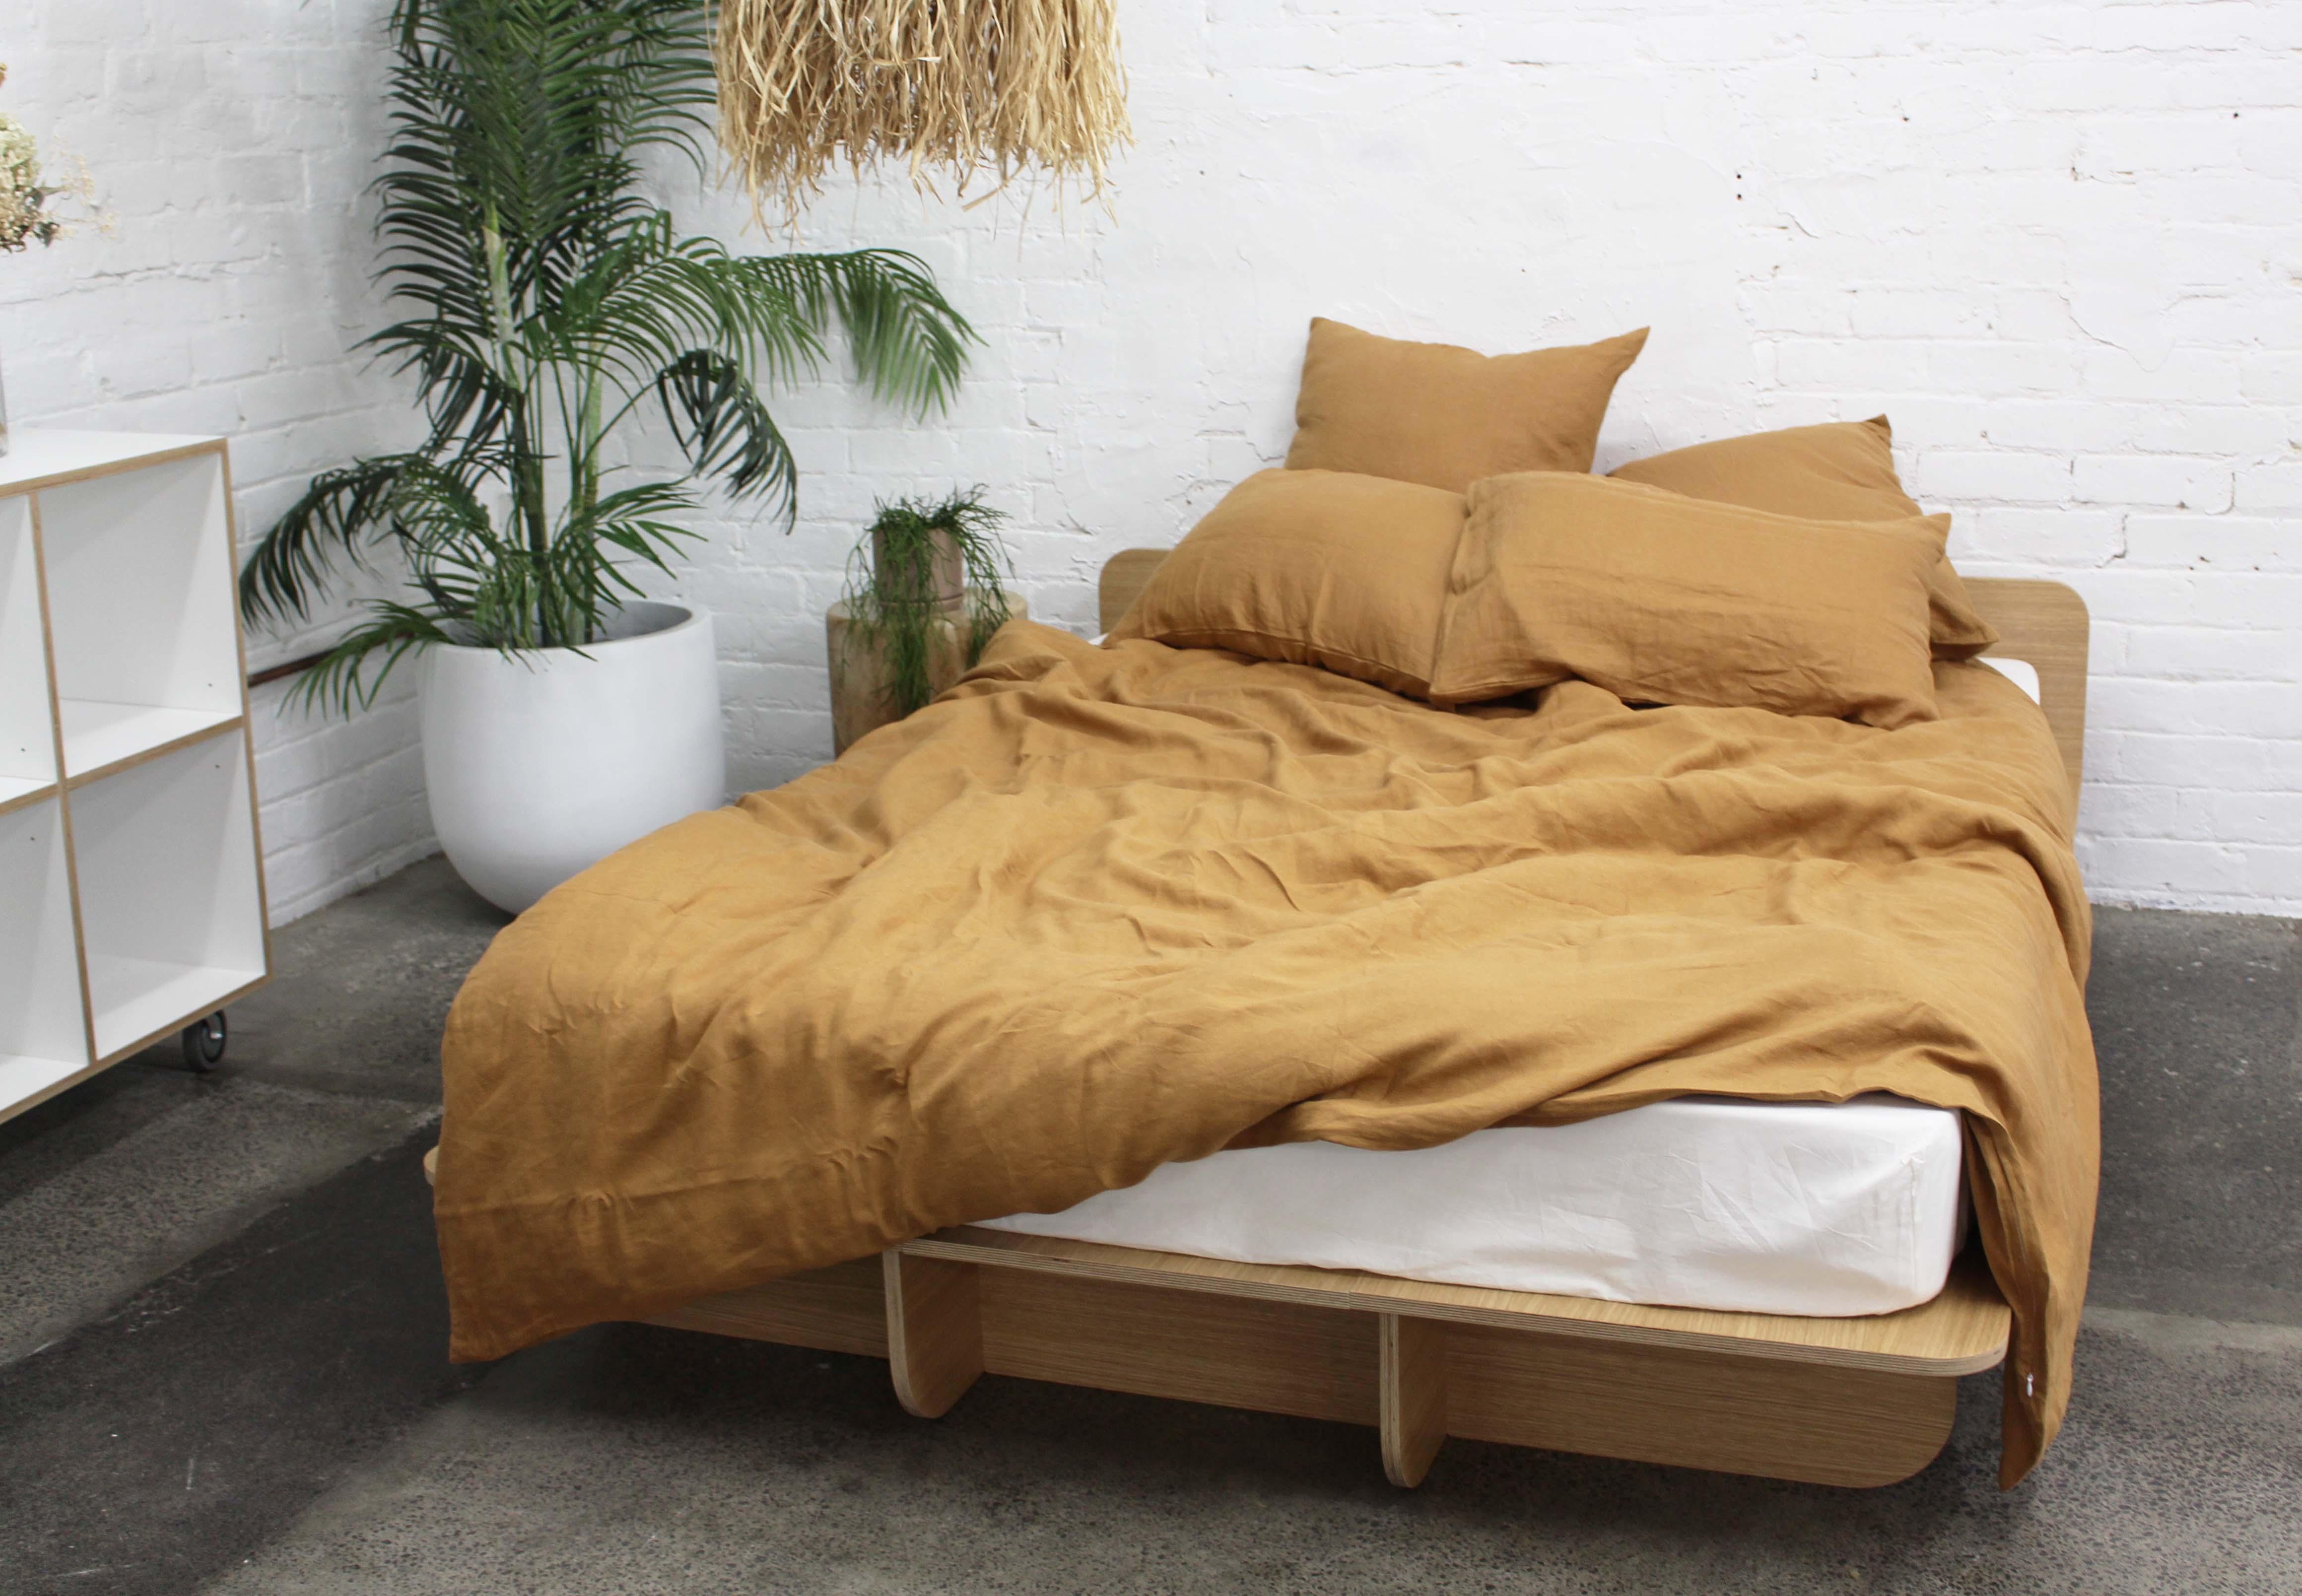 Terracotta Bed Linen